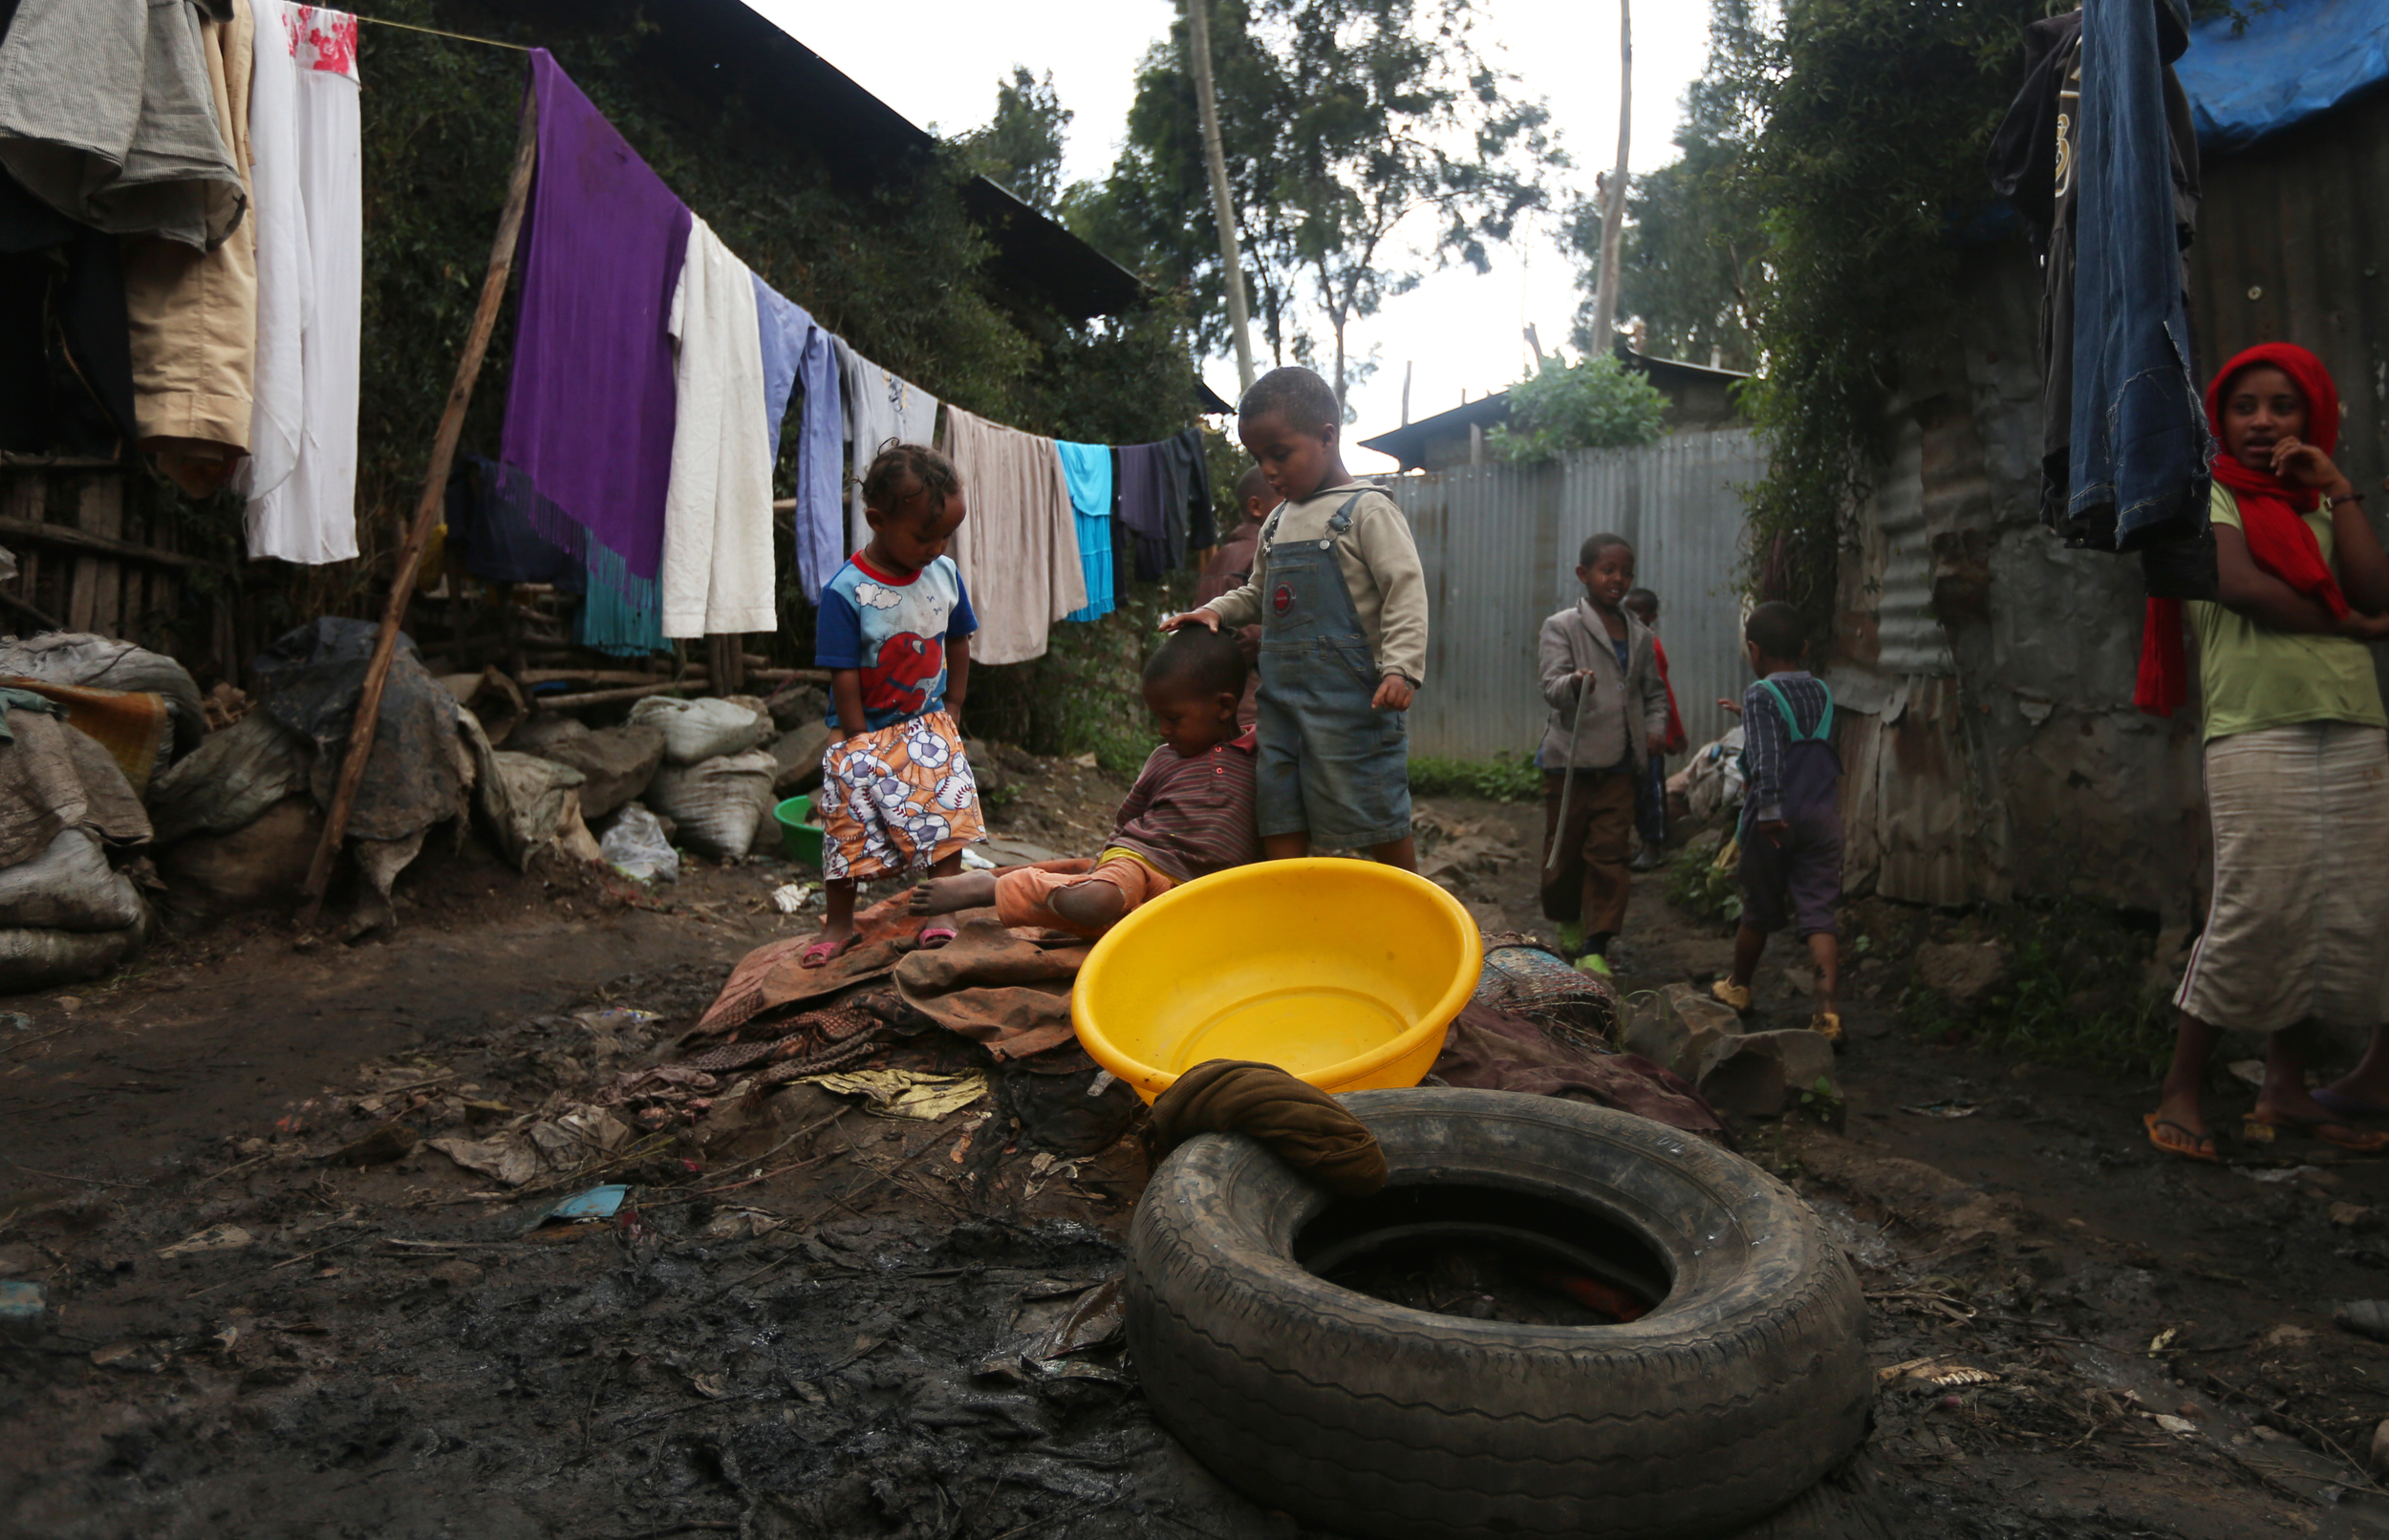 uk_Ethiopia_day5_3499_bdm.jpg